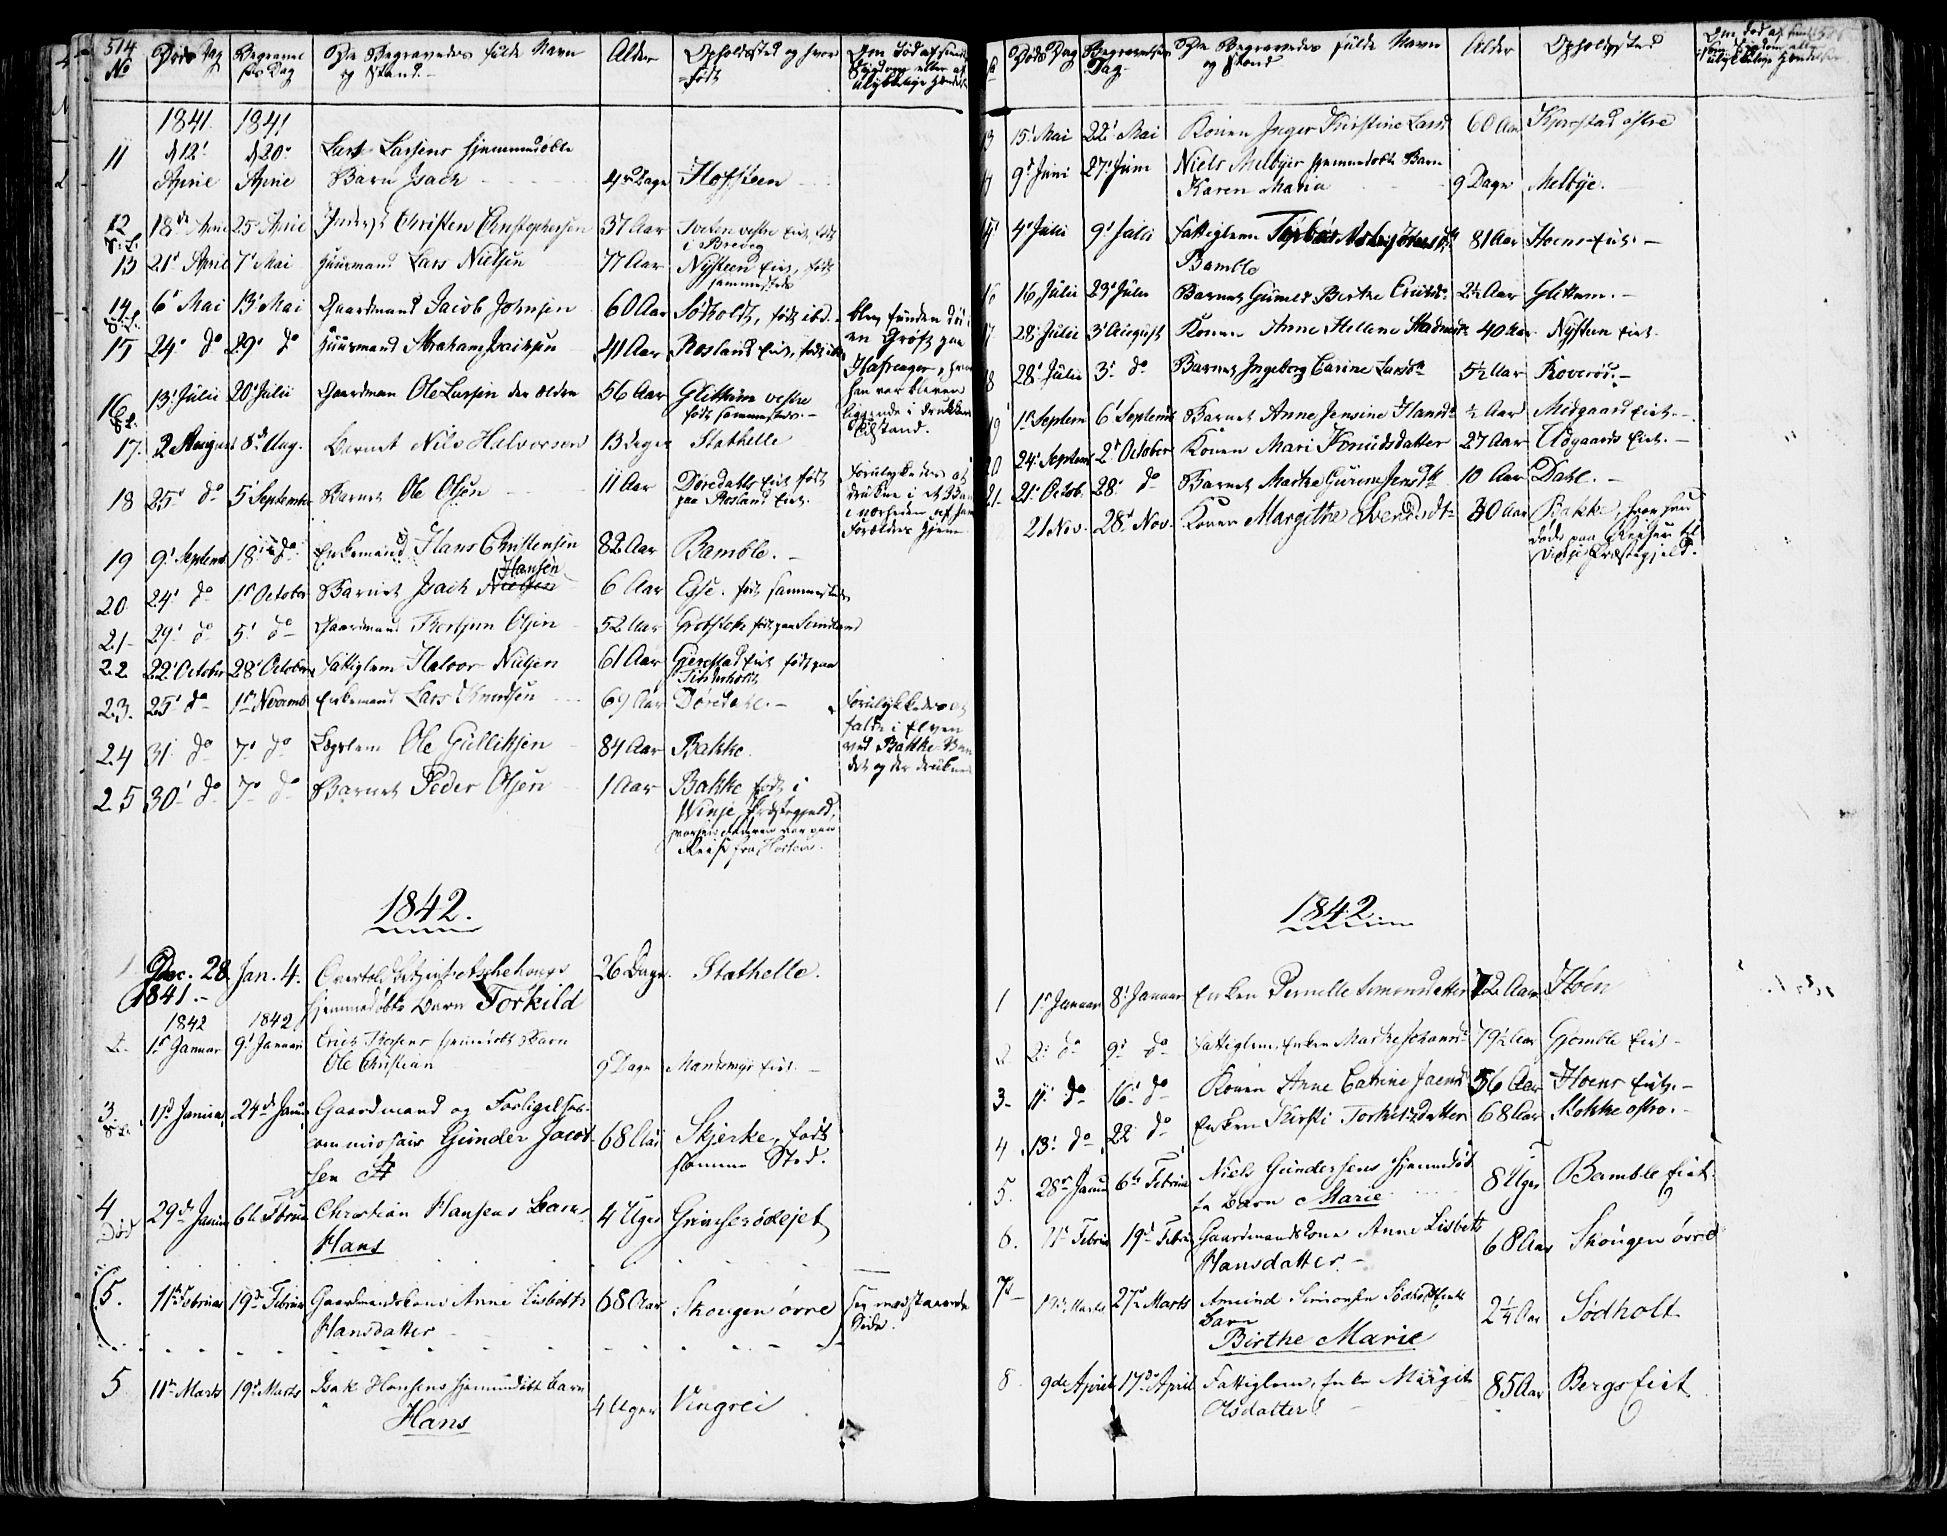 SAKO, Bamble kirkebøker, F/Fa/L0004: Ministerialbok nr. I 4, 1834-1853, s. 514-515